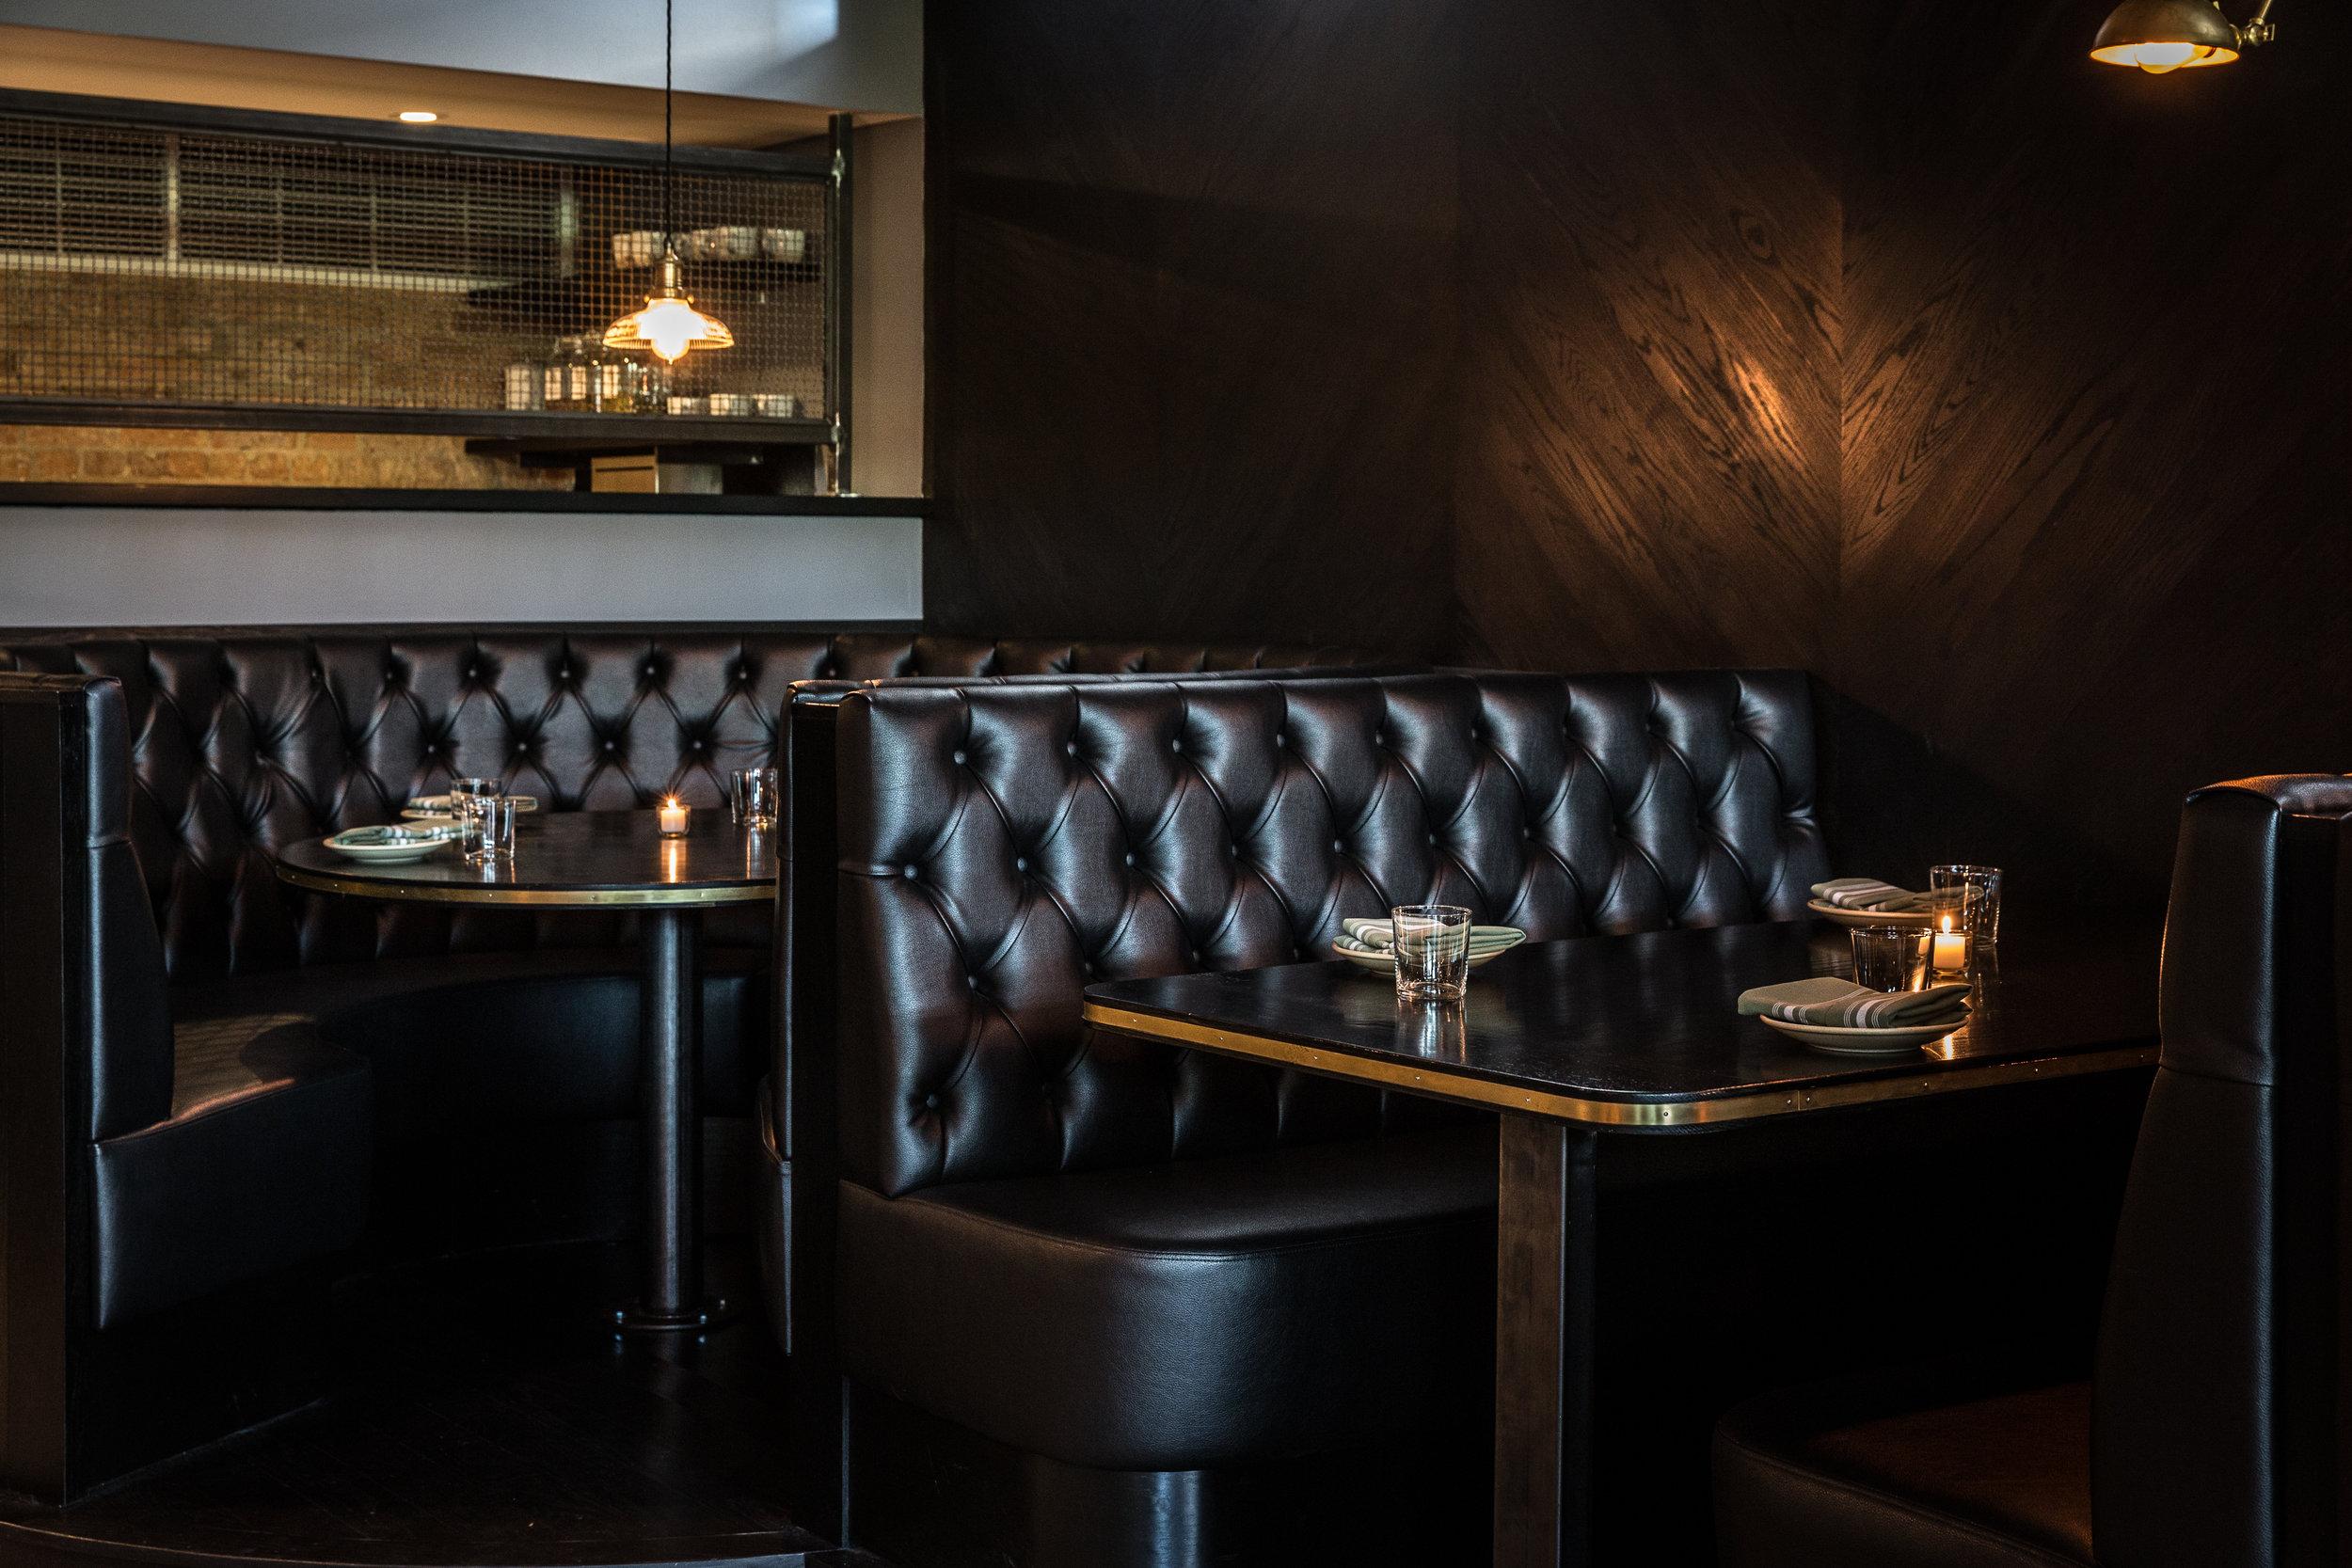 studio-saint-bars-and-restaurants-smyth-and-the-loyalist-washington-dc-17